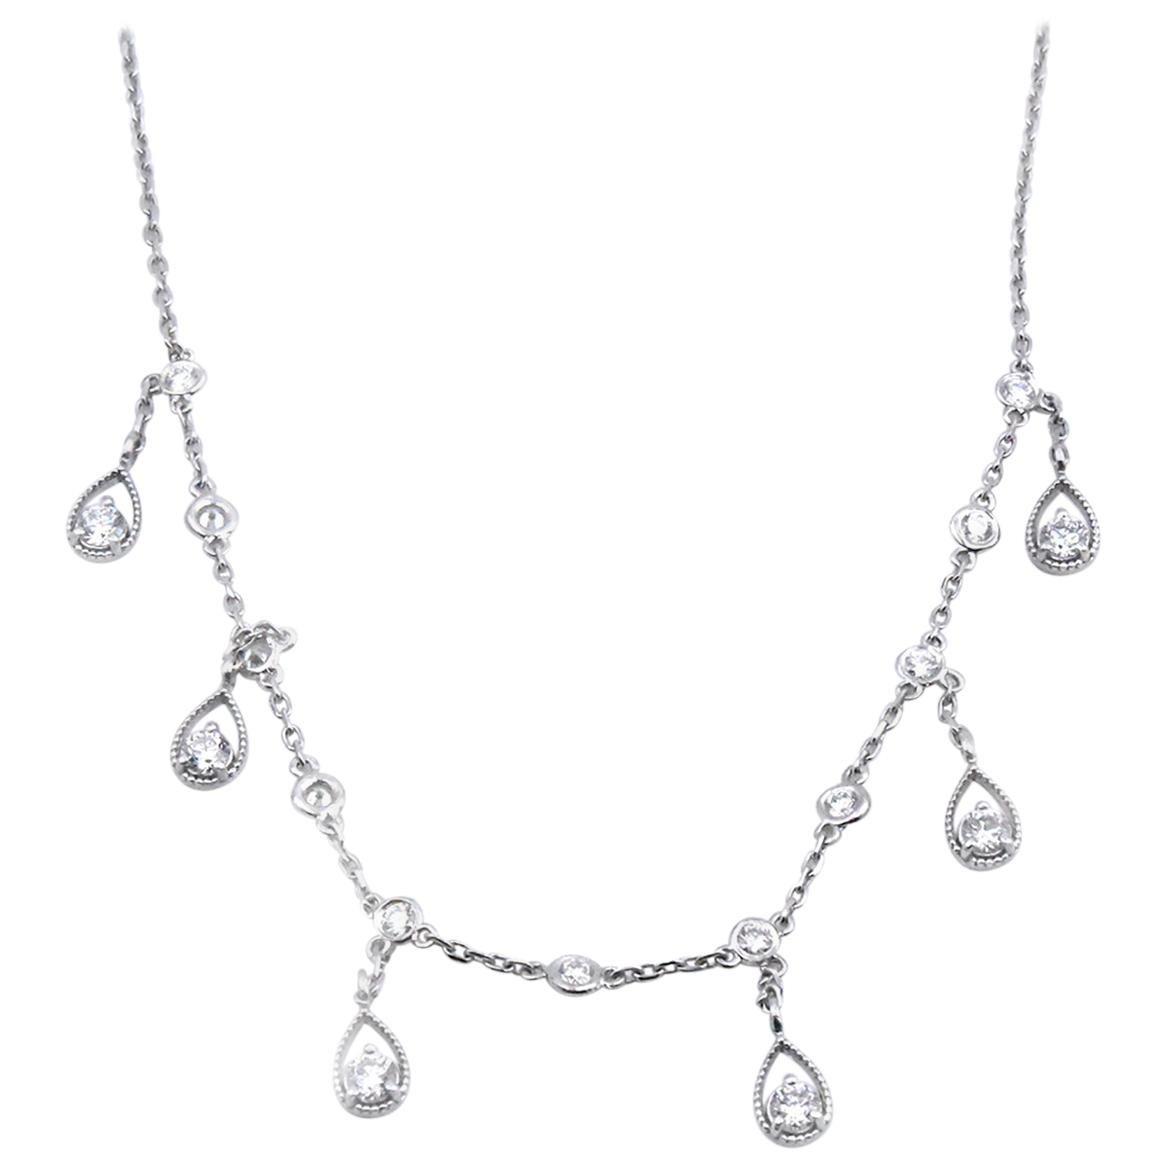 14 Karat White Gold Diamond Drop Necklace